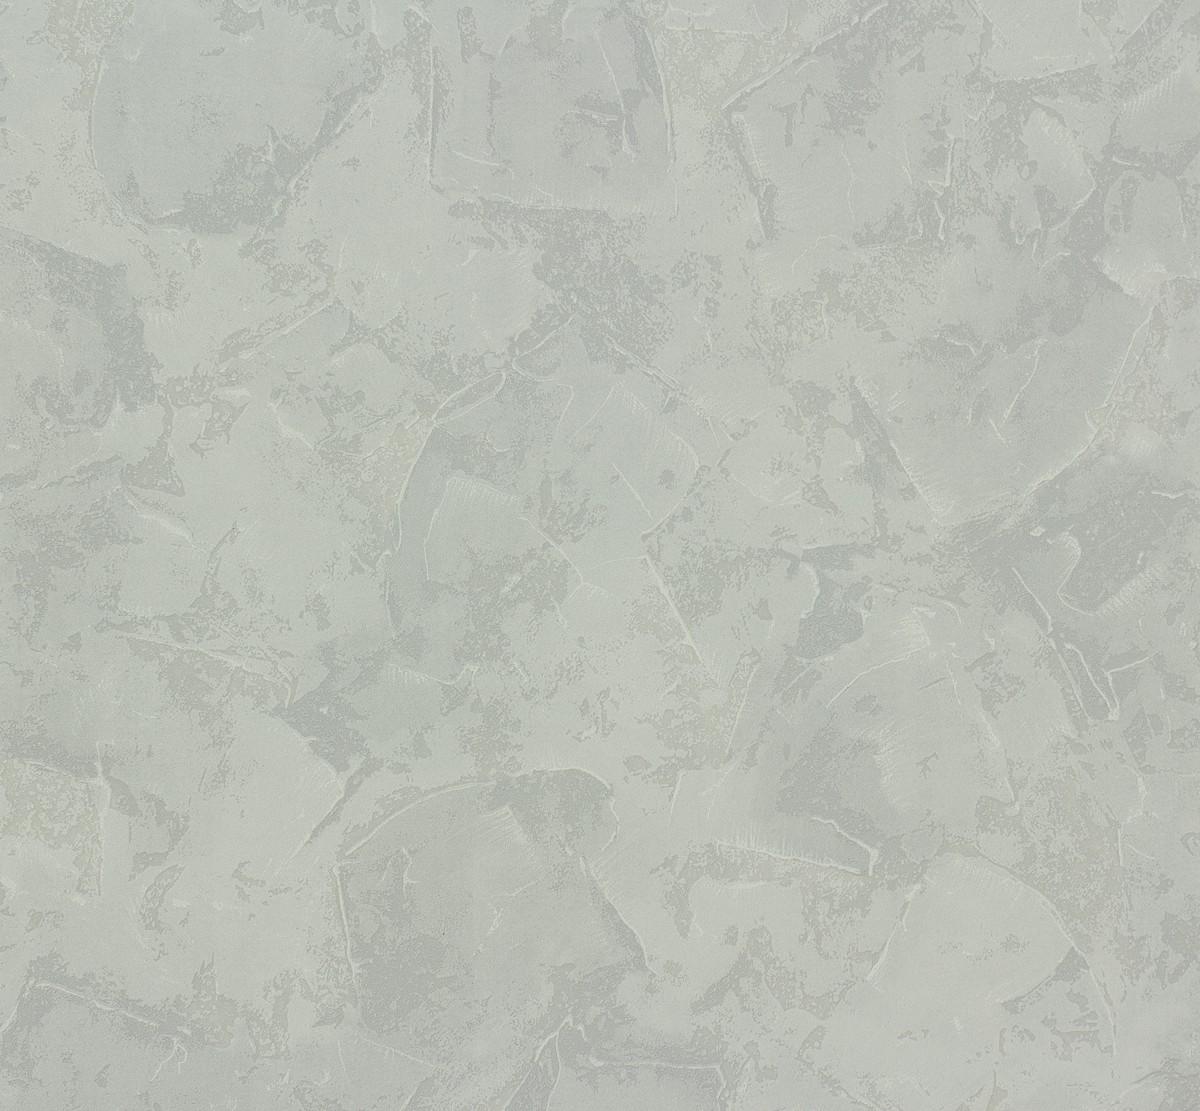 ok 6 vliestapete as creation 1482 85 148285 putz wisch optik hellgrau. Black Bedroom Furniture Sets. Home Design Ideas